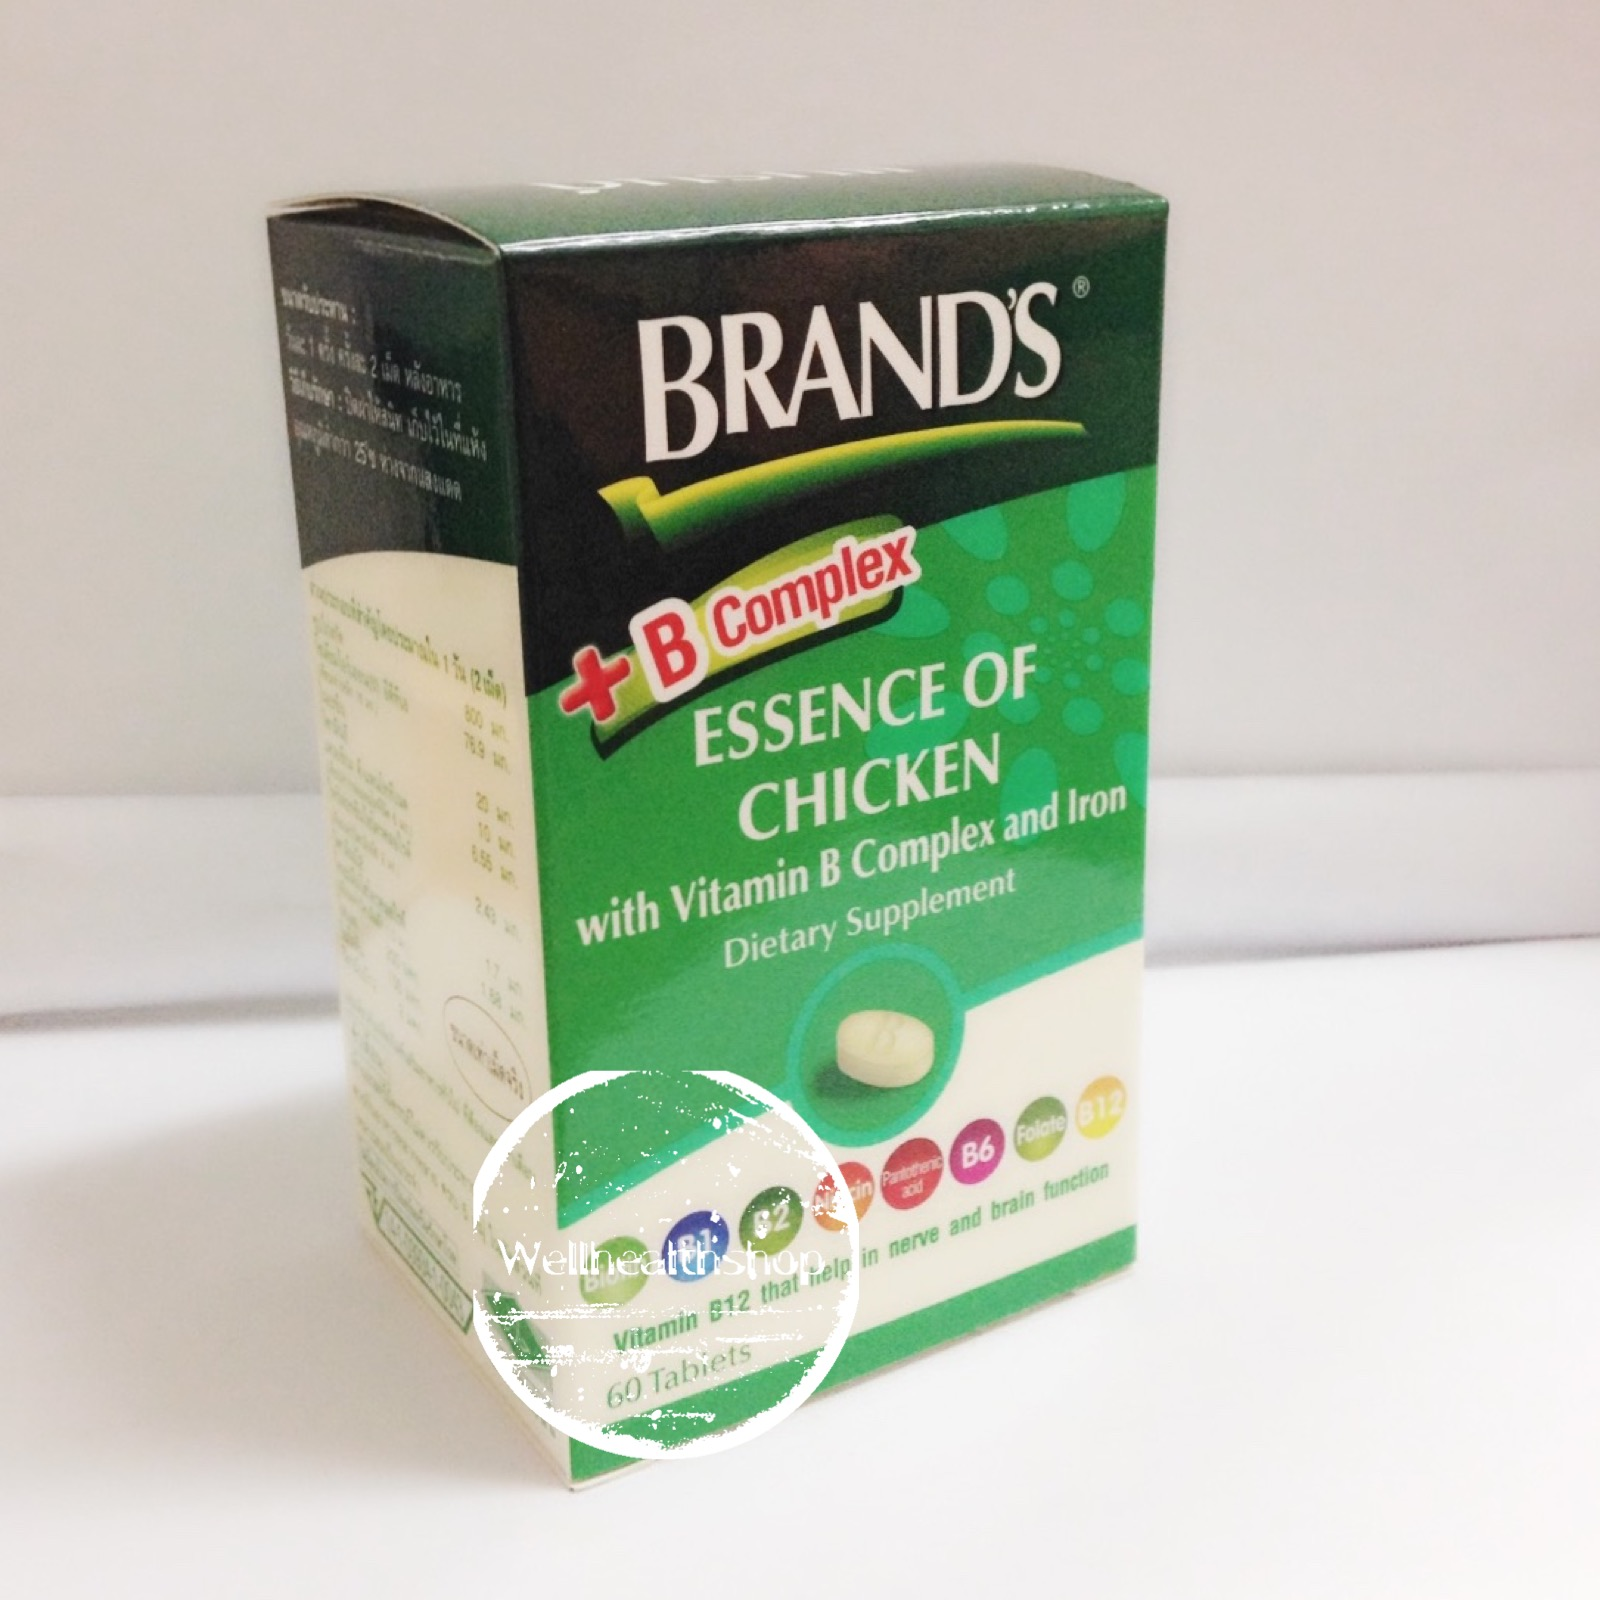 Brand แบรนด์ ซุปไก่สกัด ผสมวิตามินบี คอมเพล็กซ์และธาตุเหล็ก